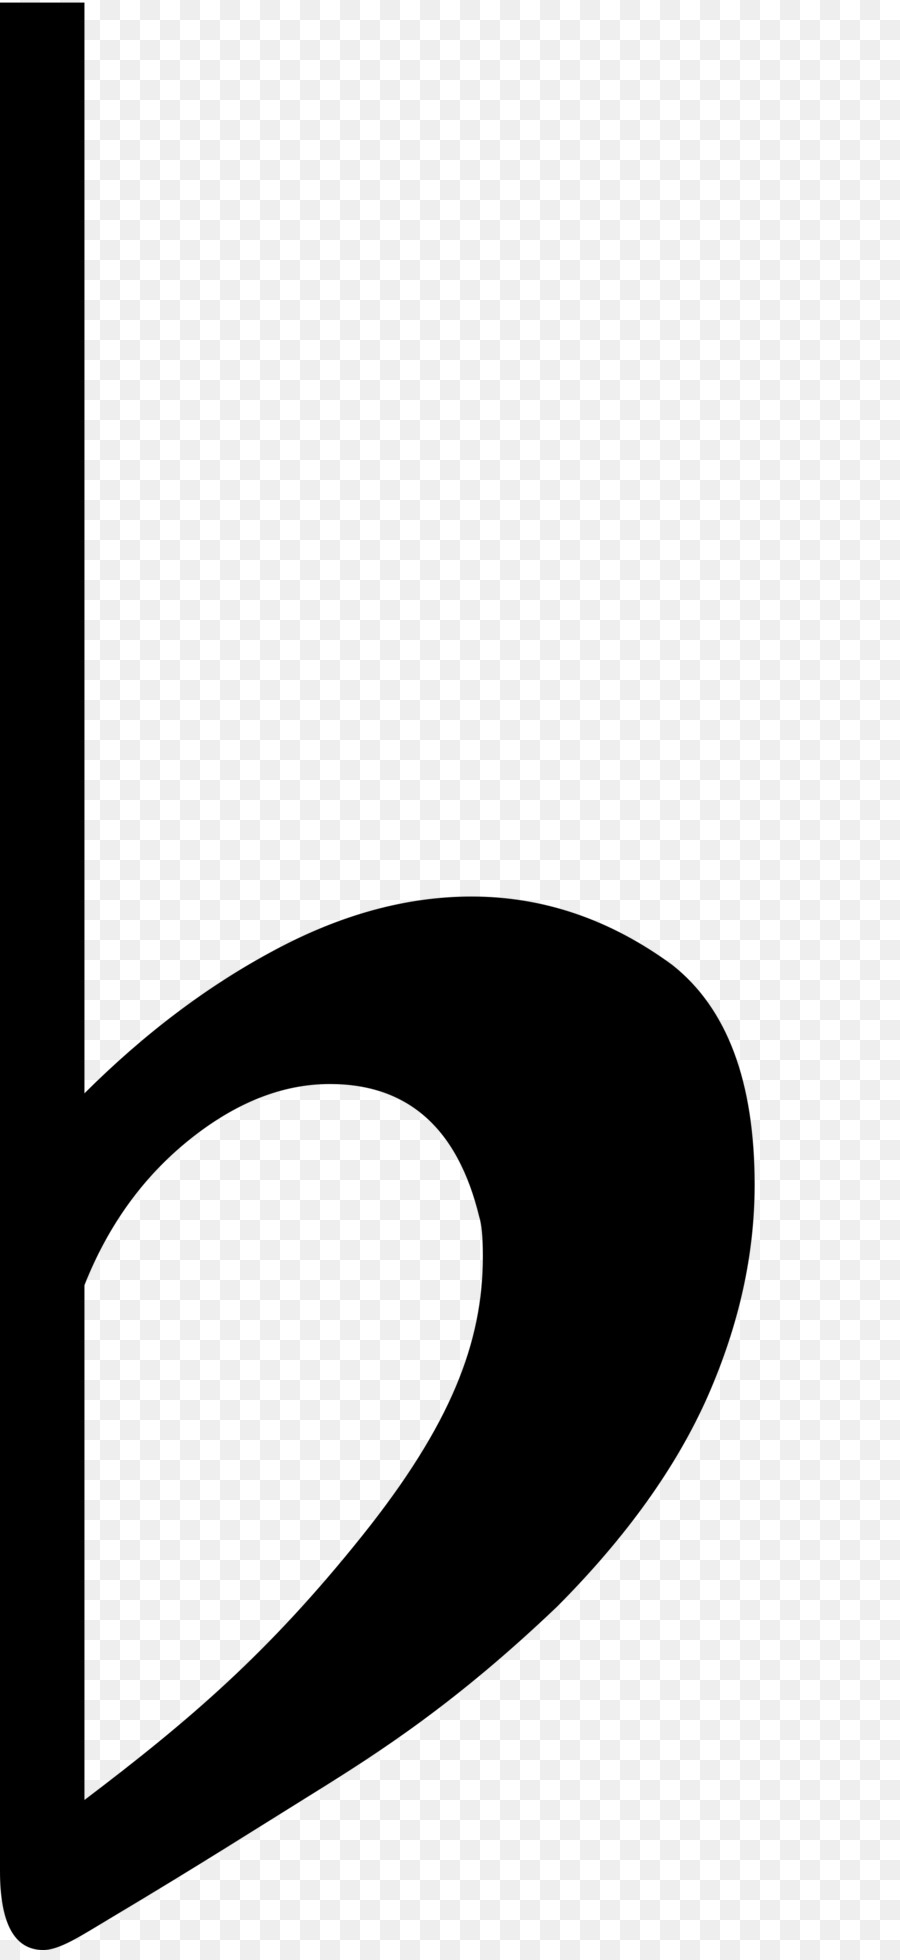 Flat Symbol Natural Accidental Musical Note Flat Png Download